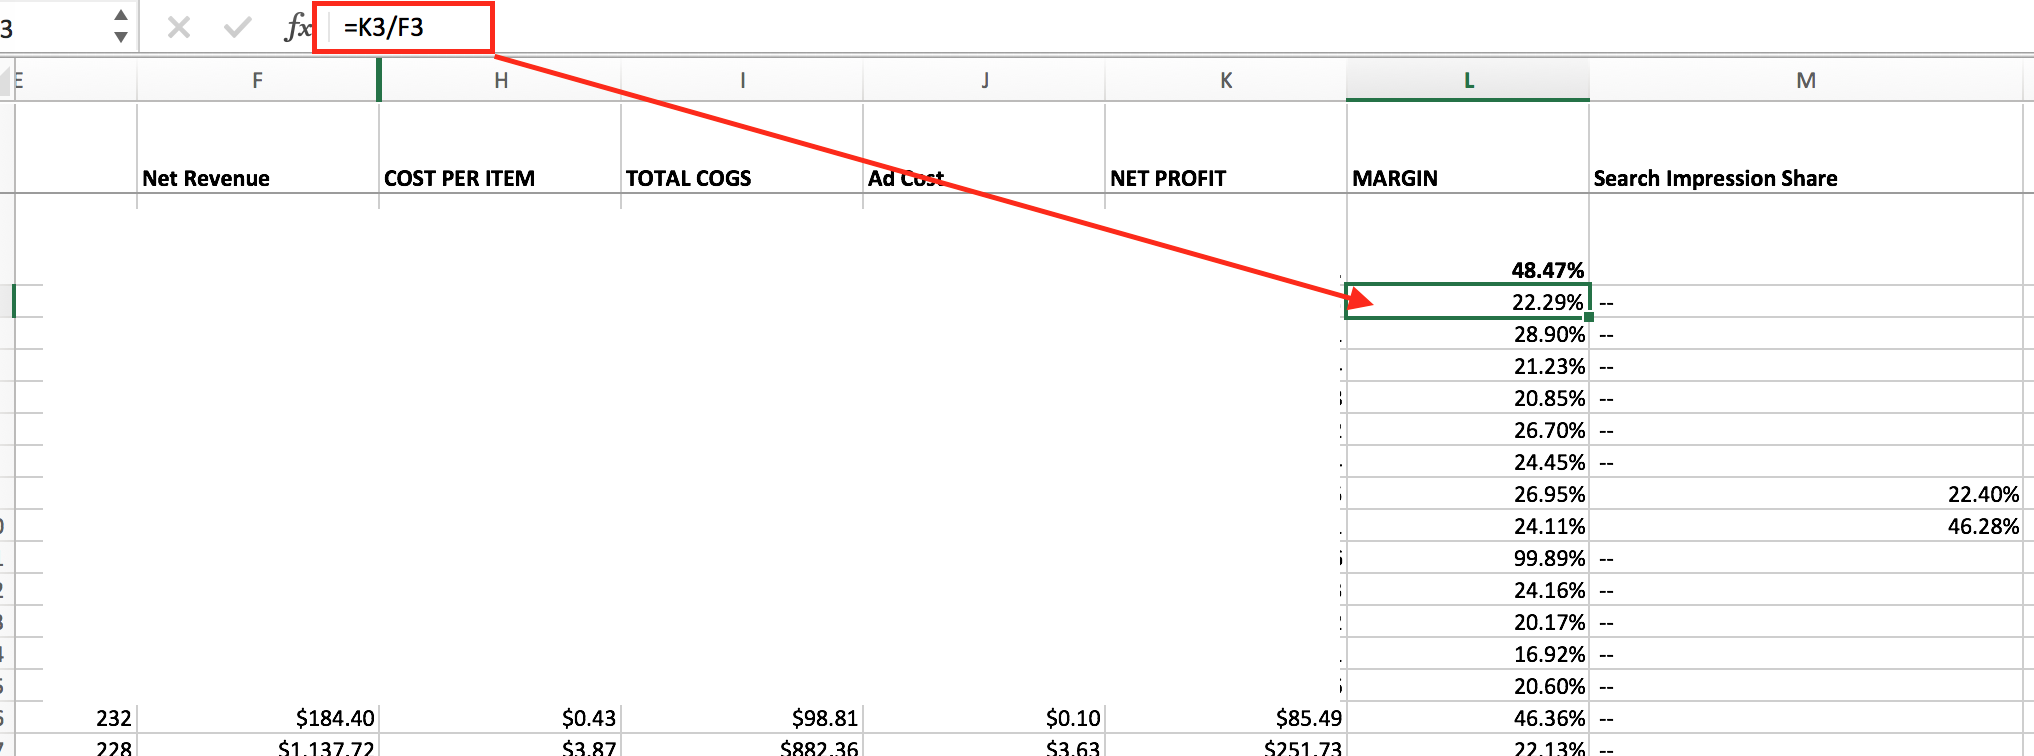 margin-column